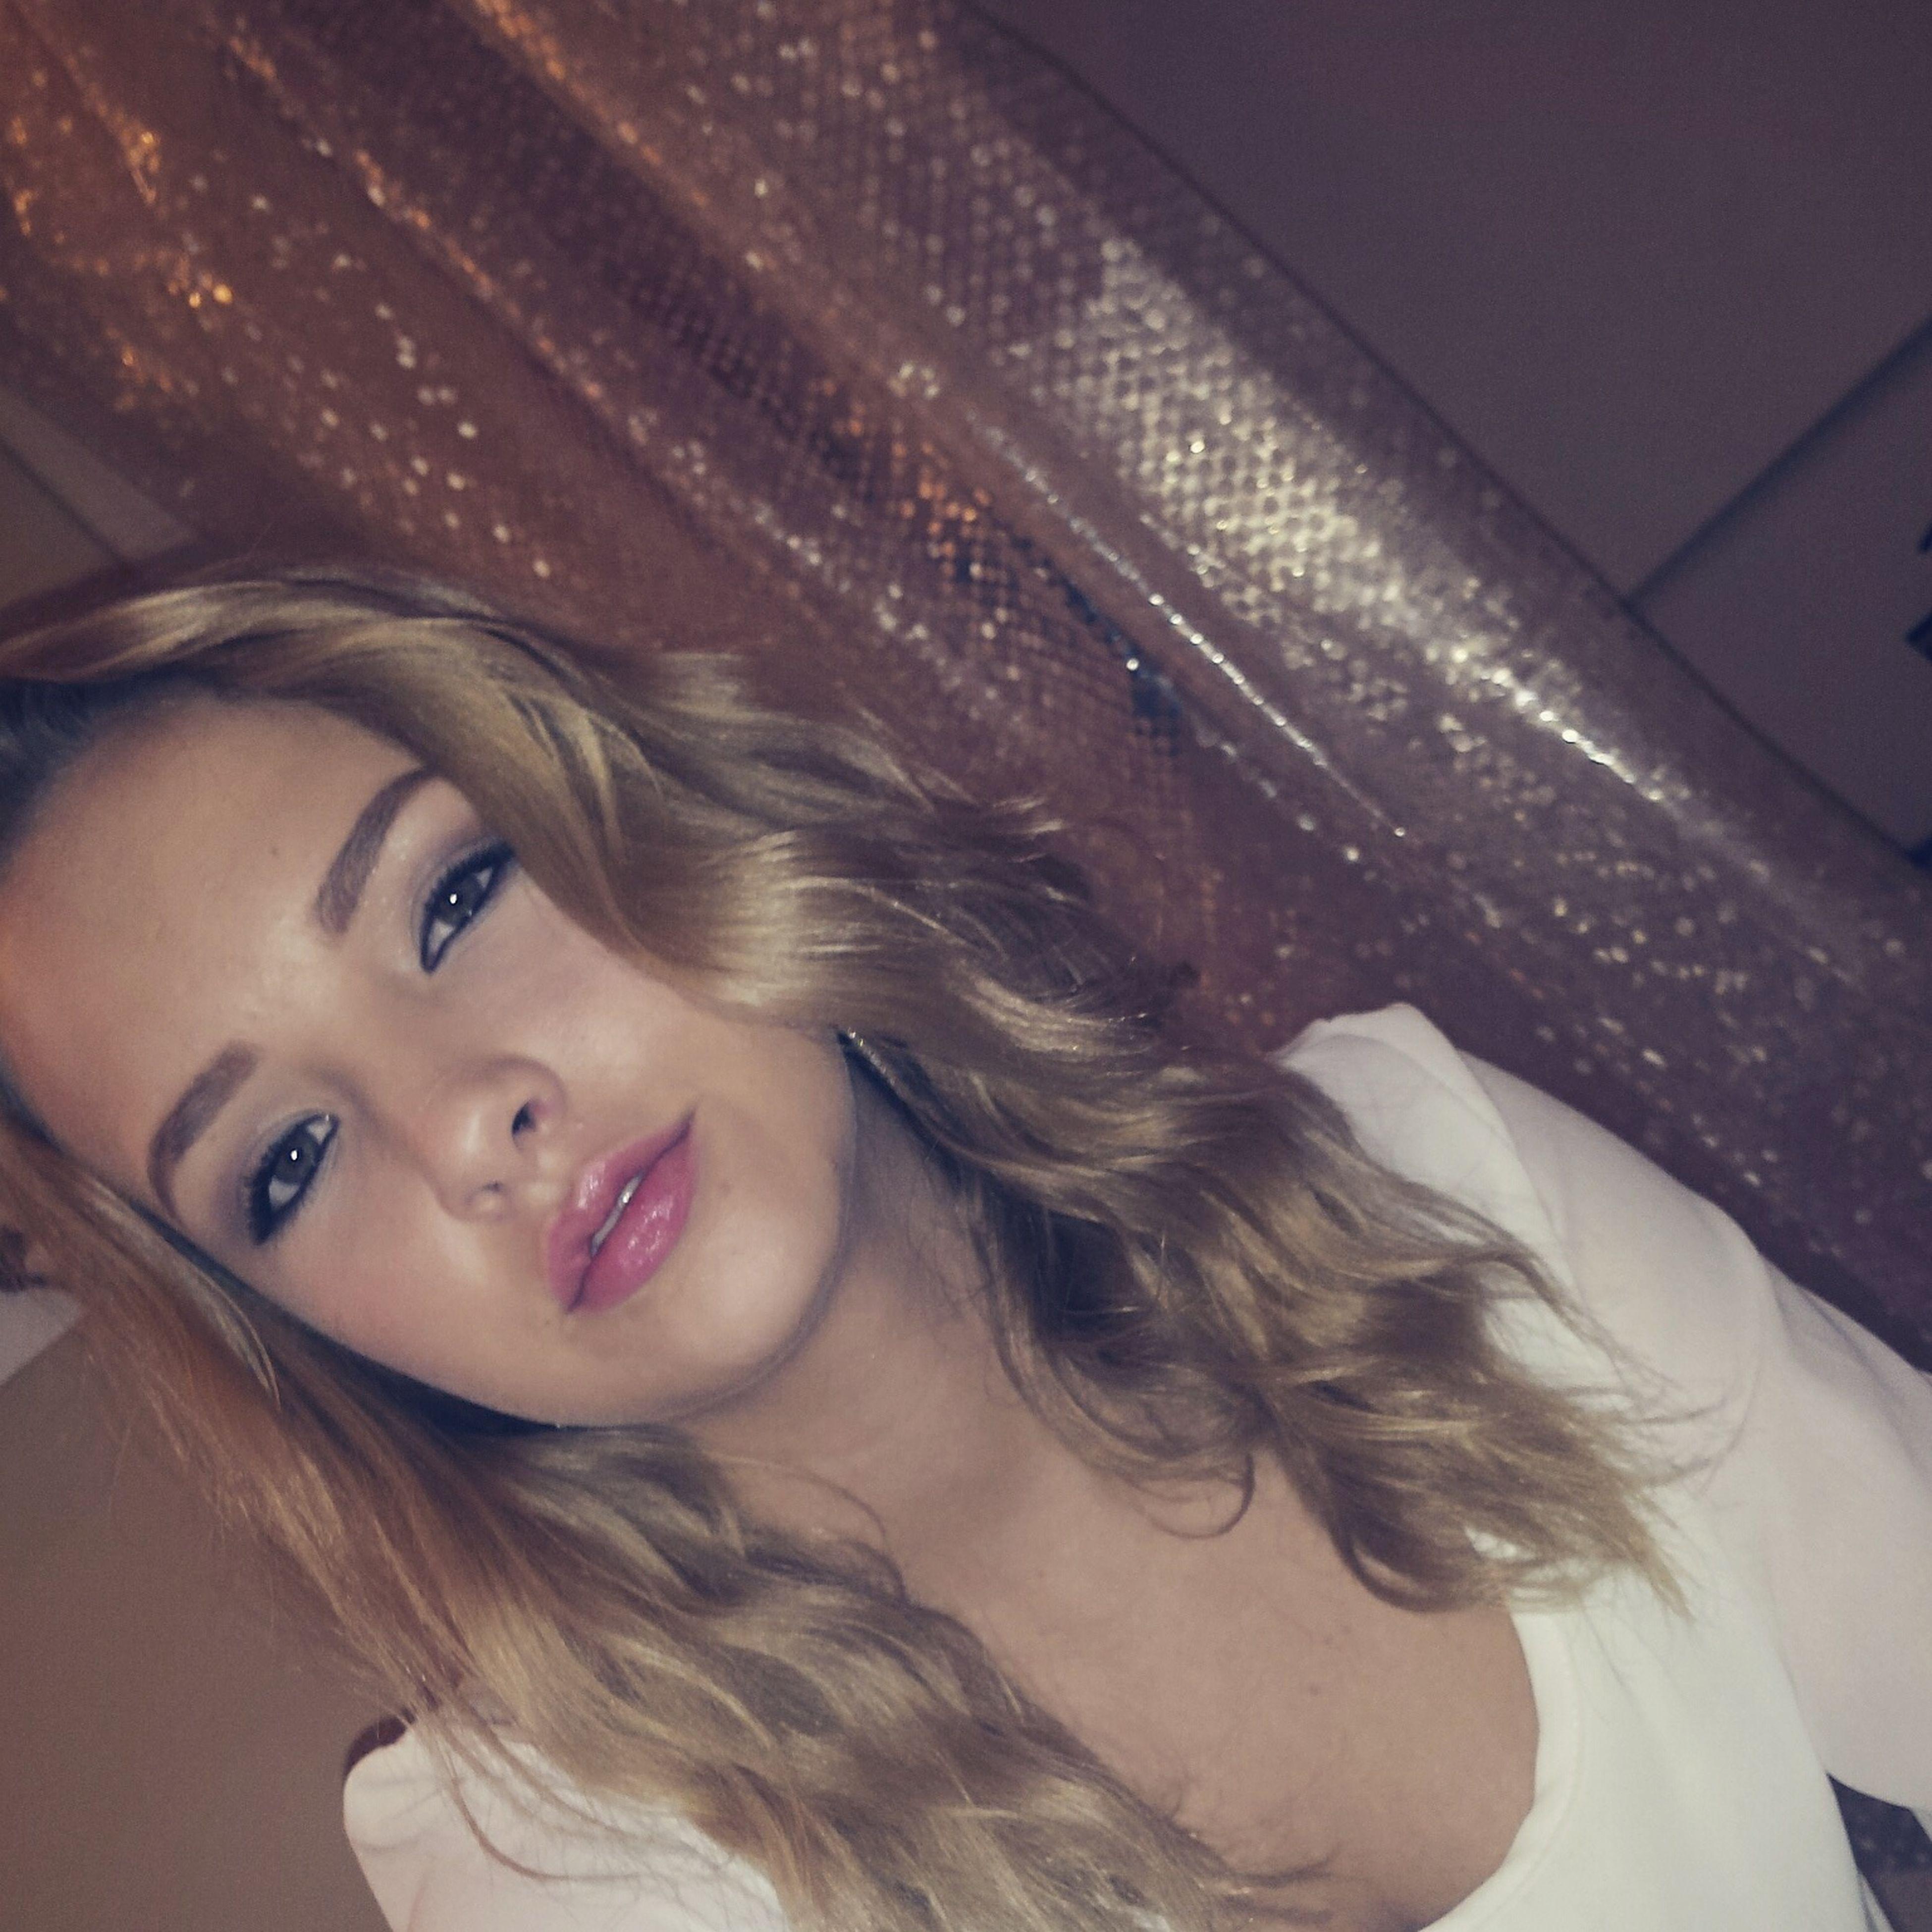 Shimmer Late Night Pretty Girl Pretty Lips(: Makeup